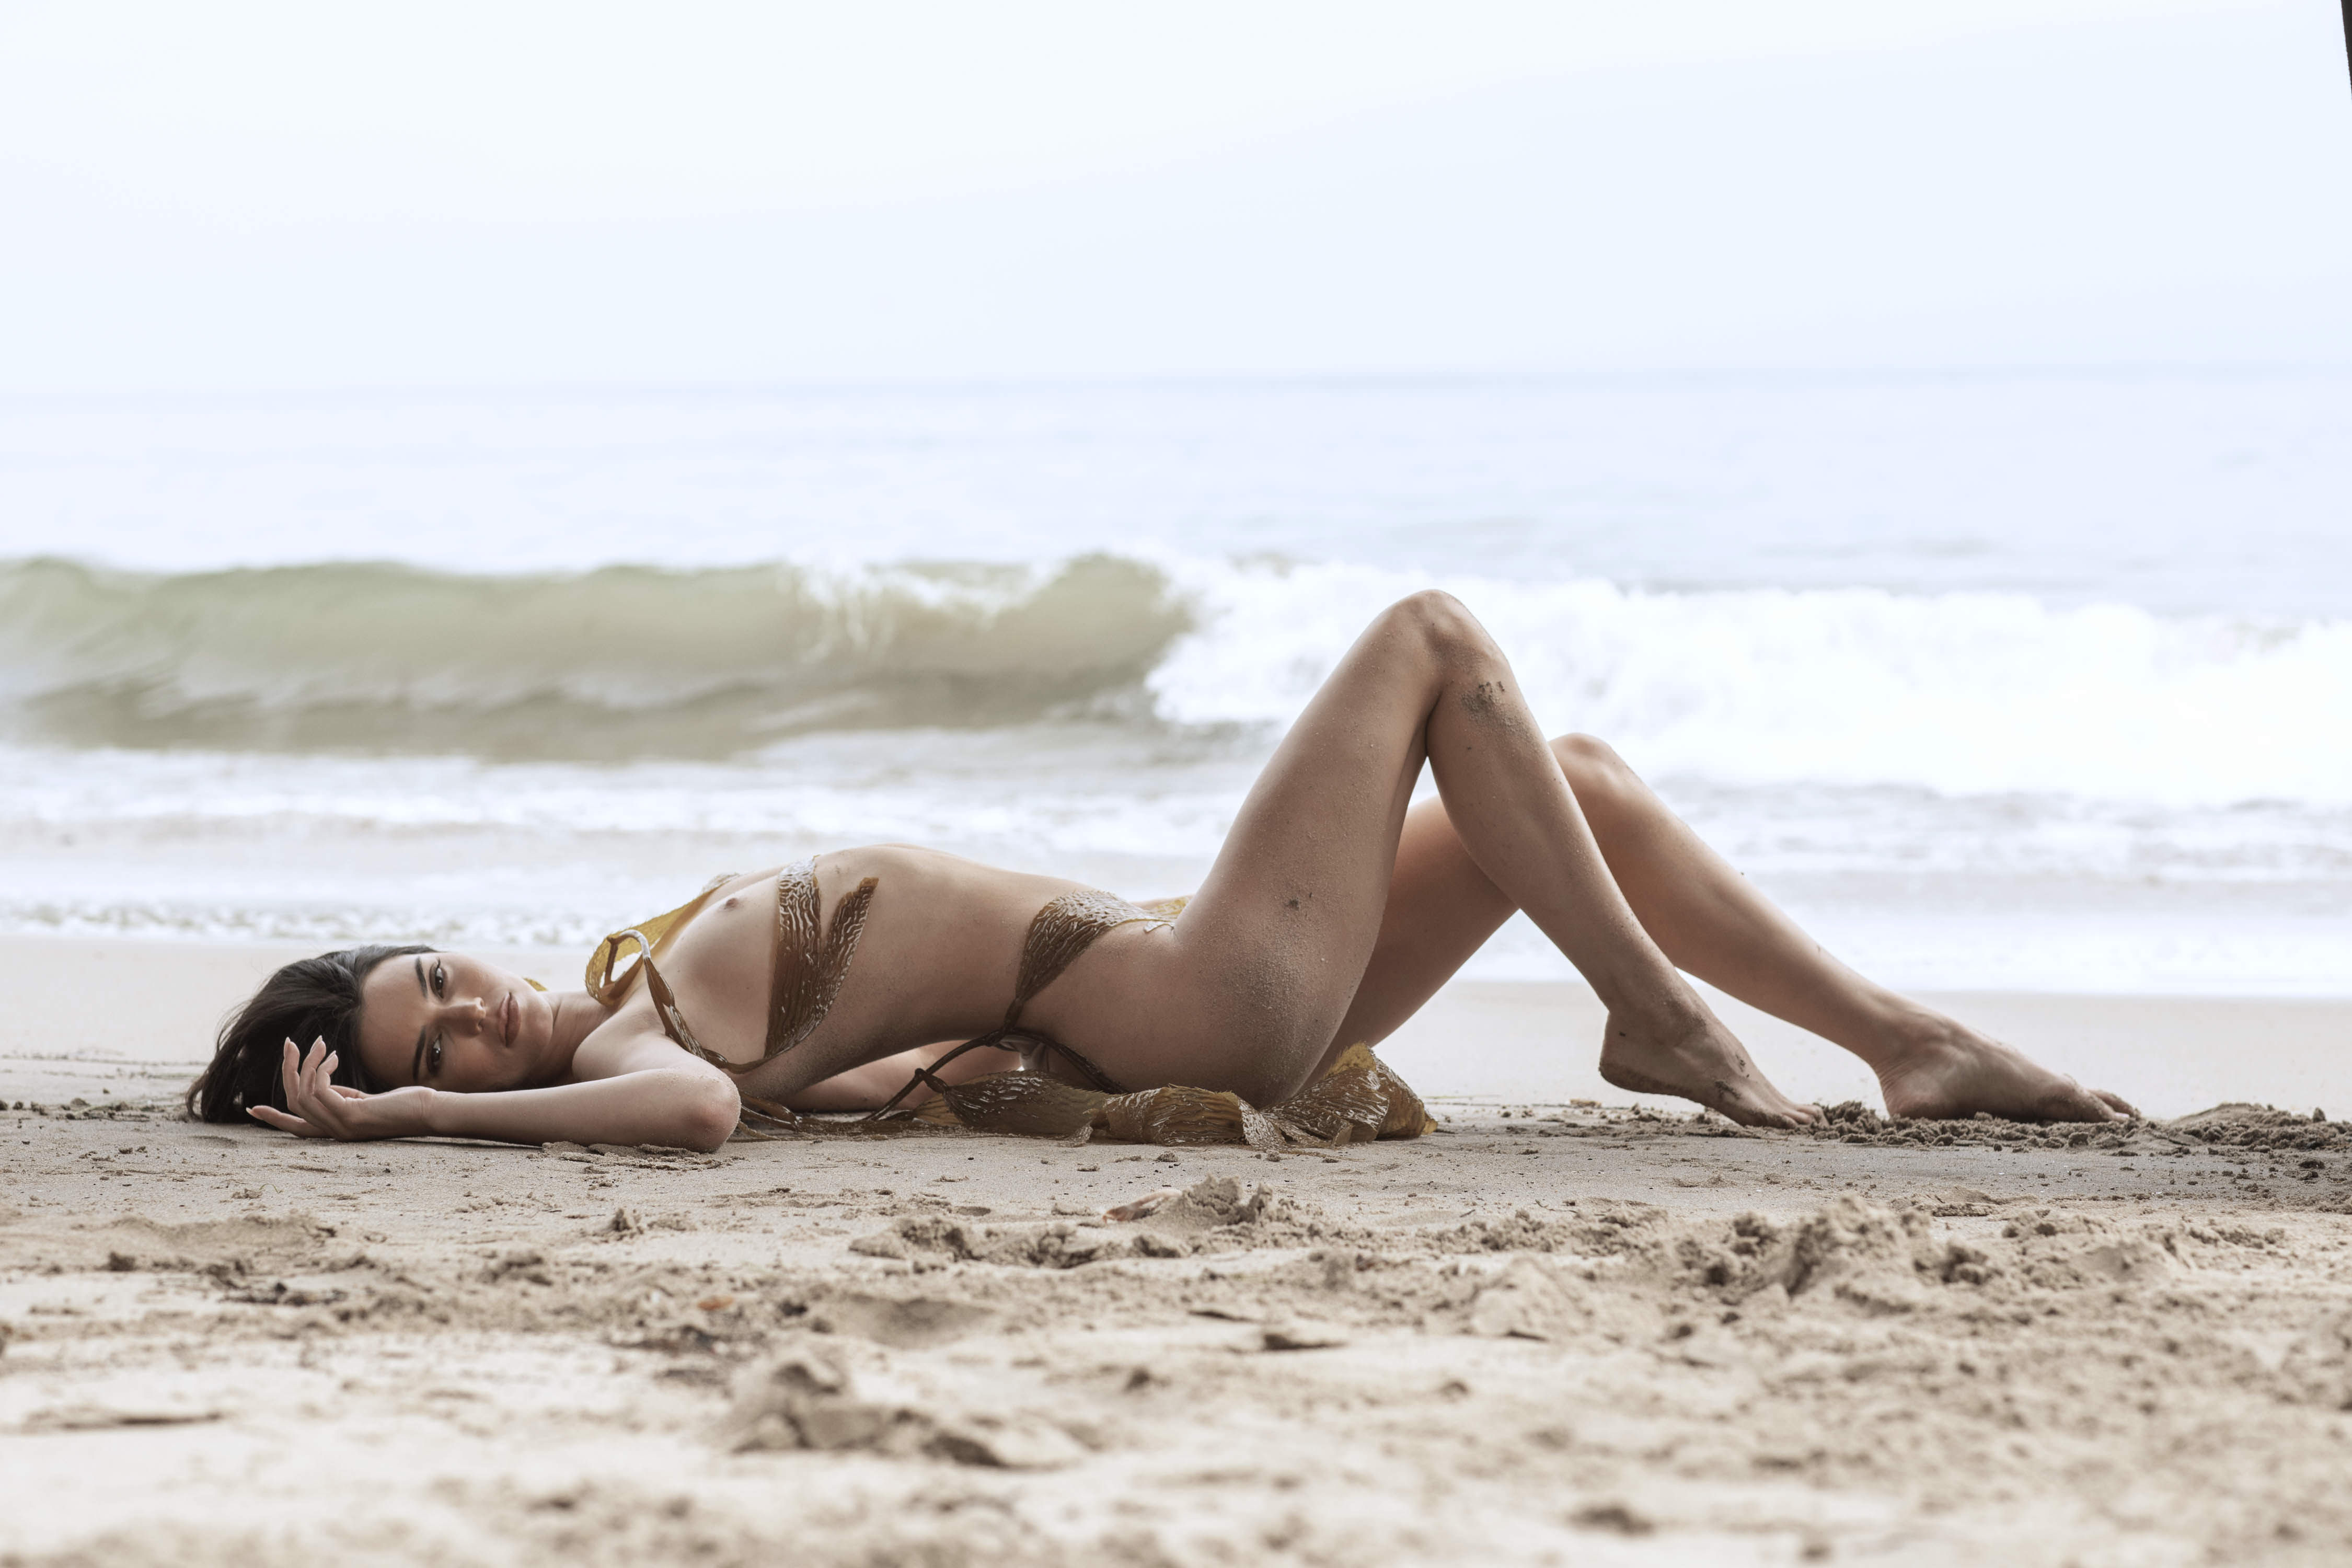 0810235419680_38_Kendall-Jenner-Nude-TheFappeningBlog.com-39.jpg